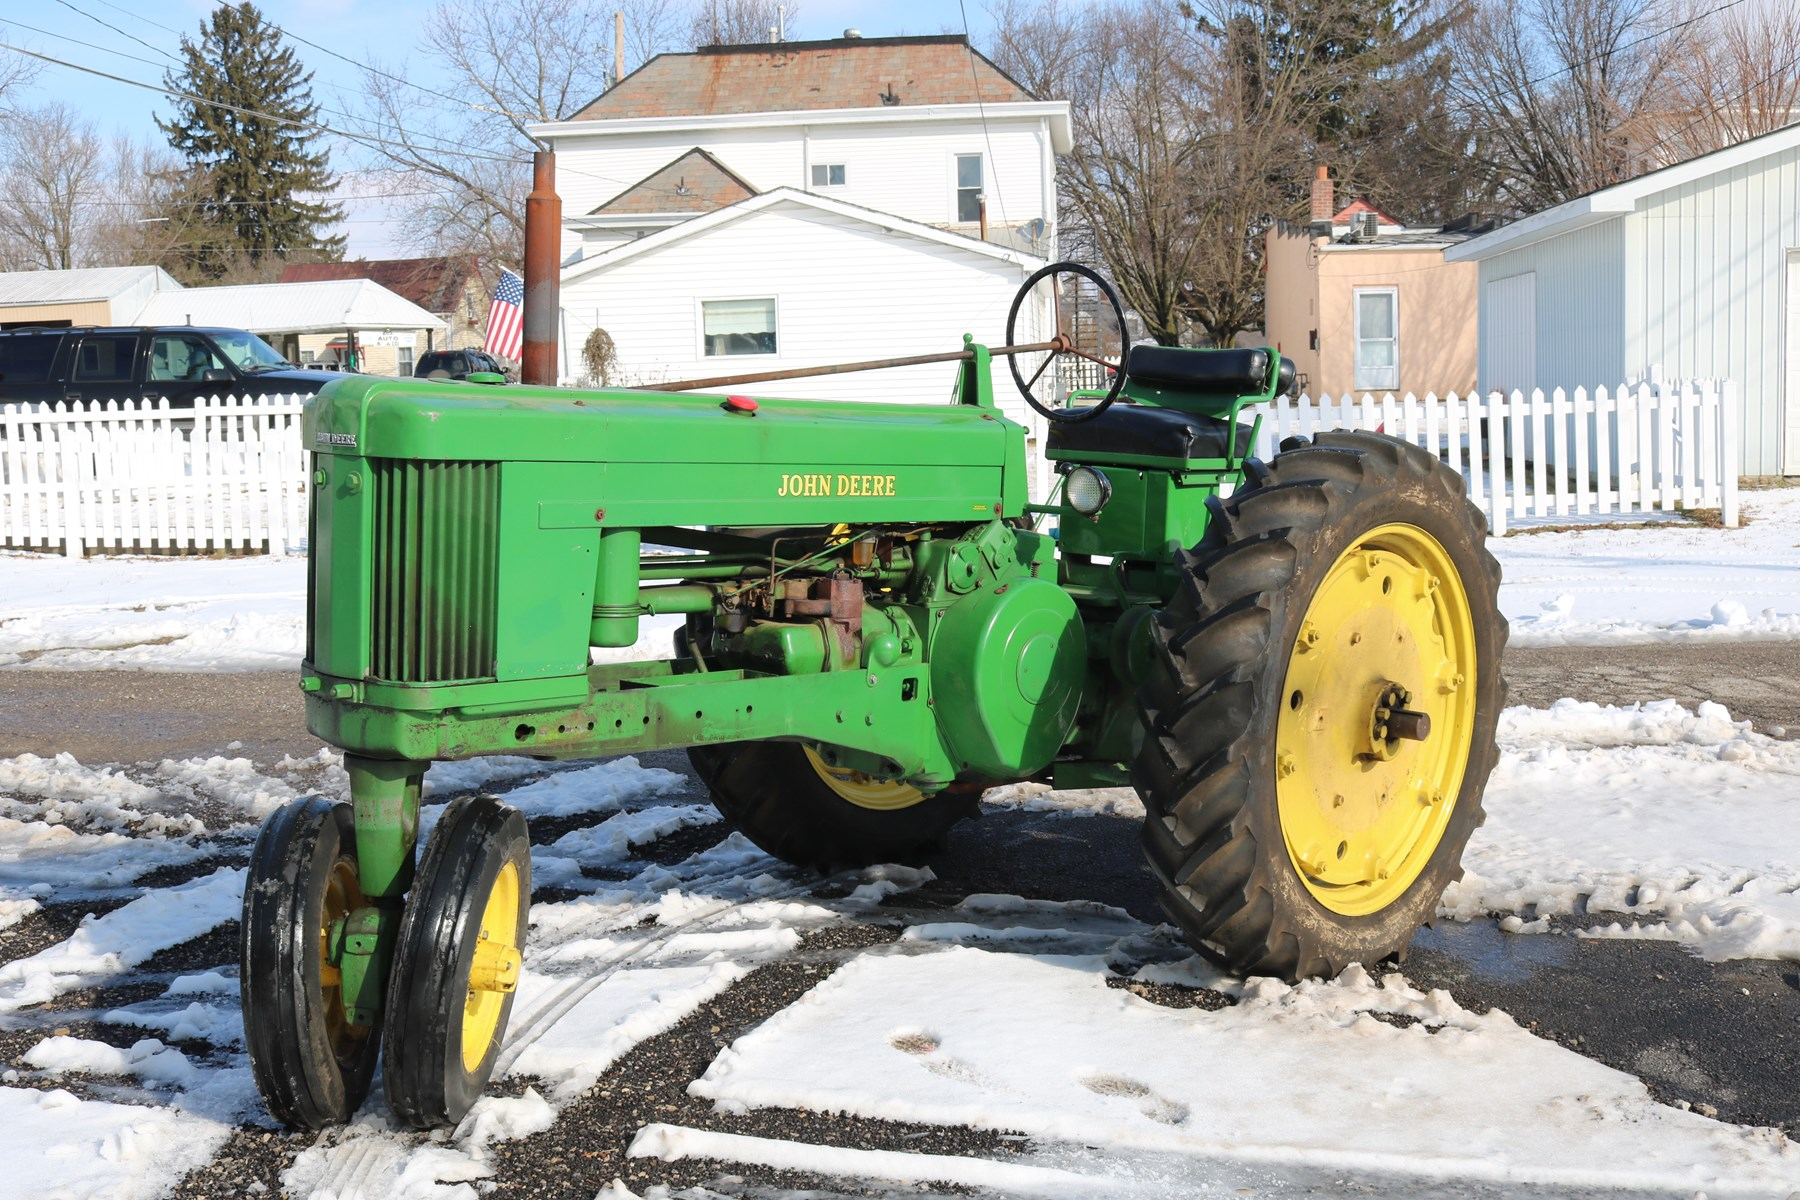 John Deere 50 Tractor, Part, Toys, Trains, Knives, & Manuals